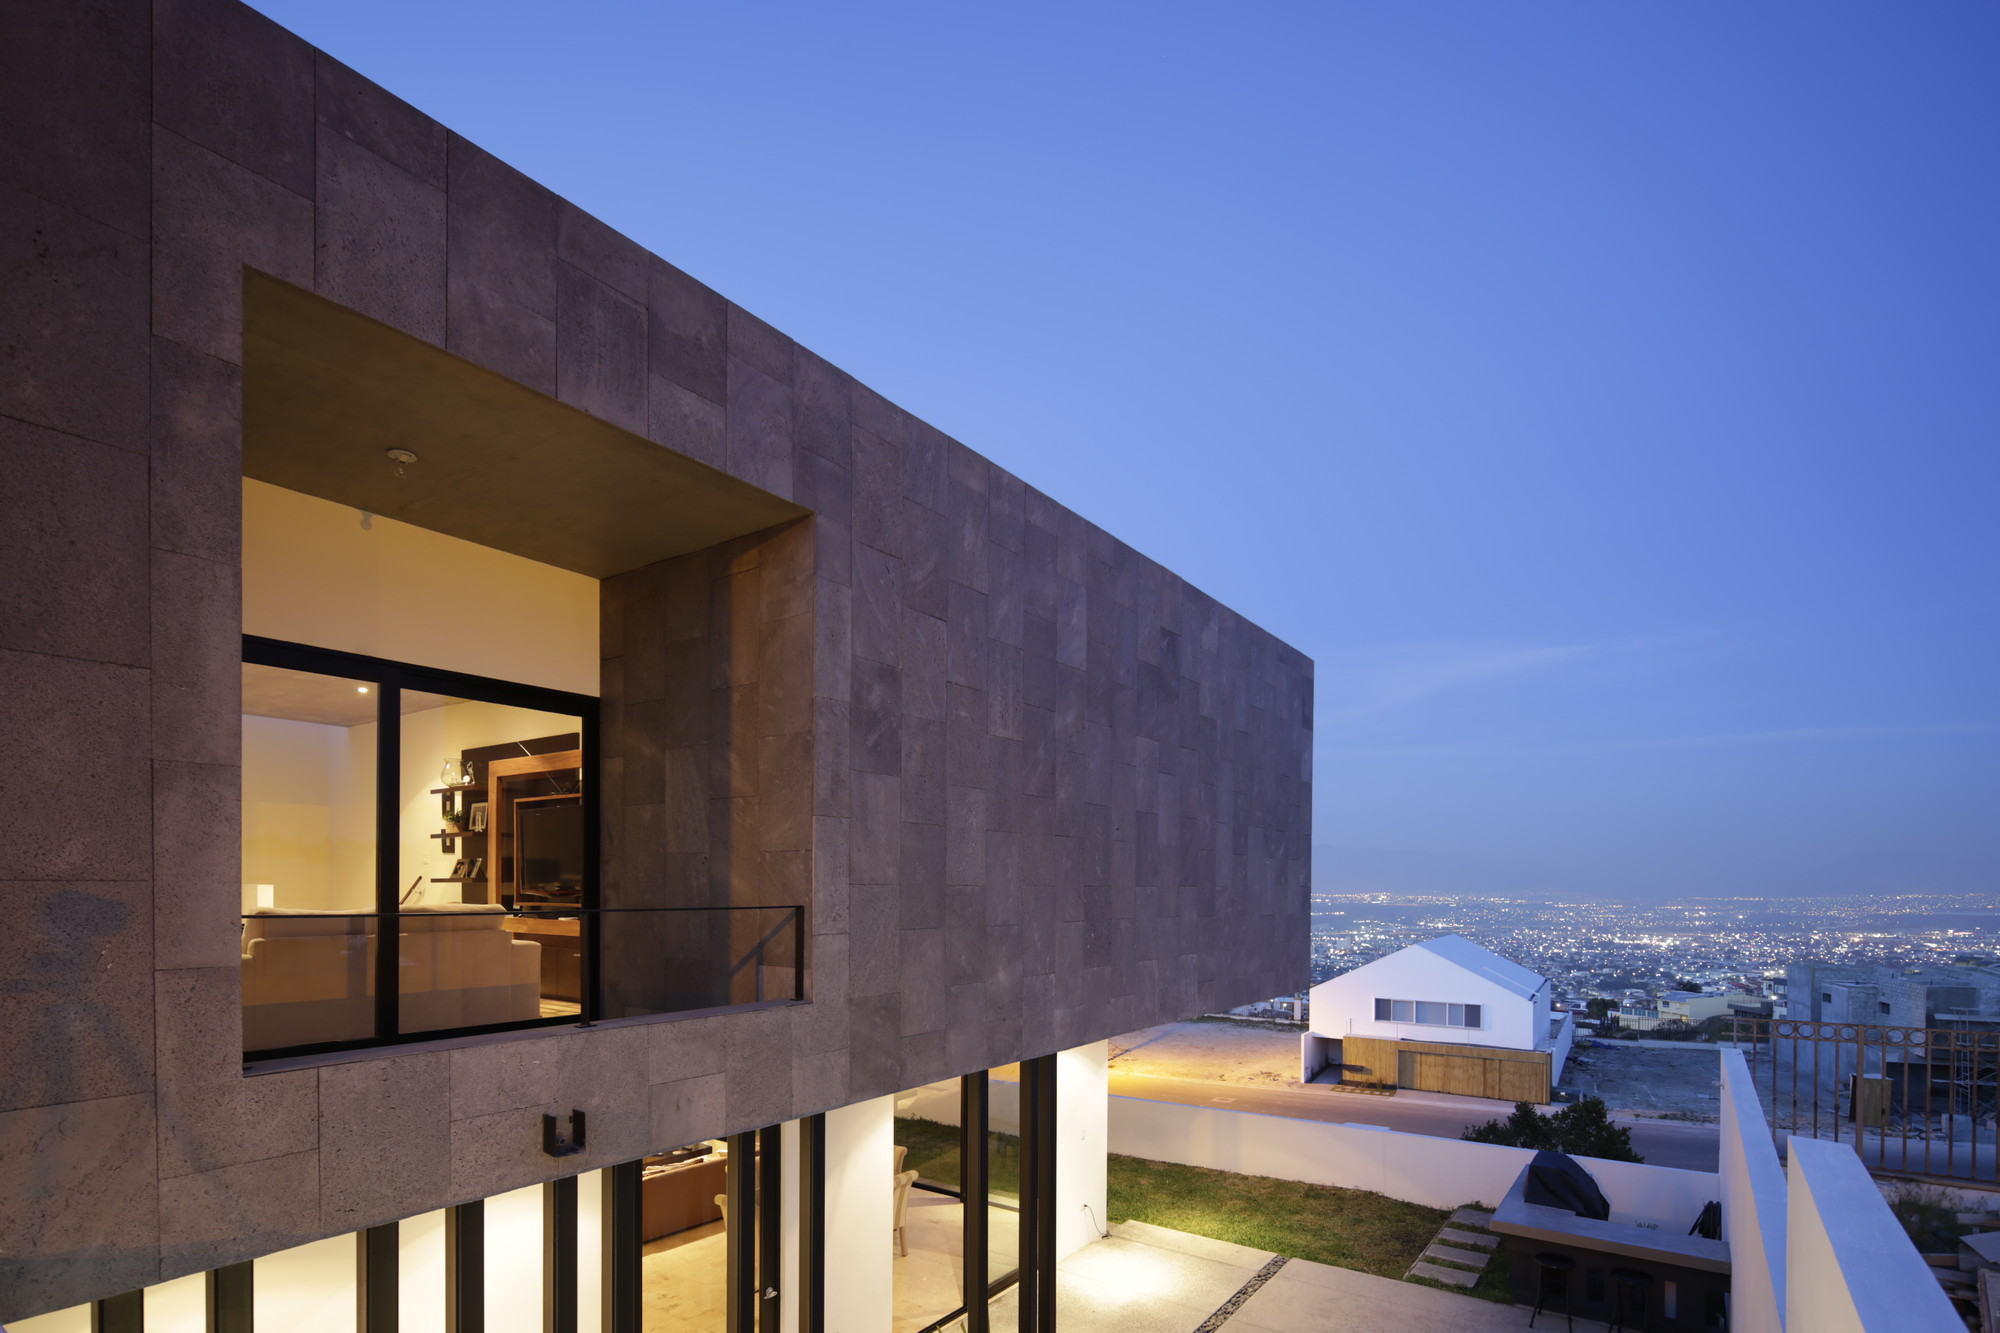 Casa HDJ58 / T38 studio + Pablo Casals-Aguirre